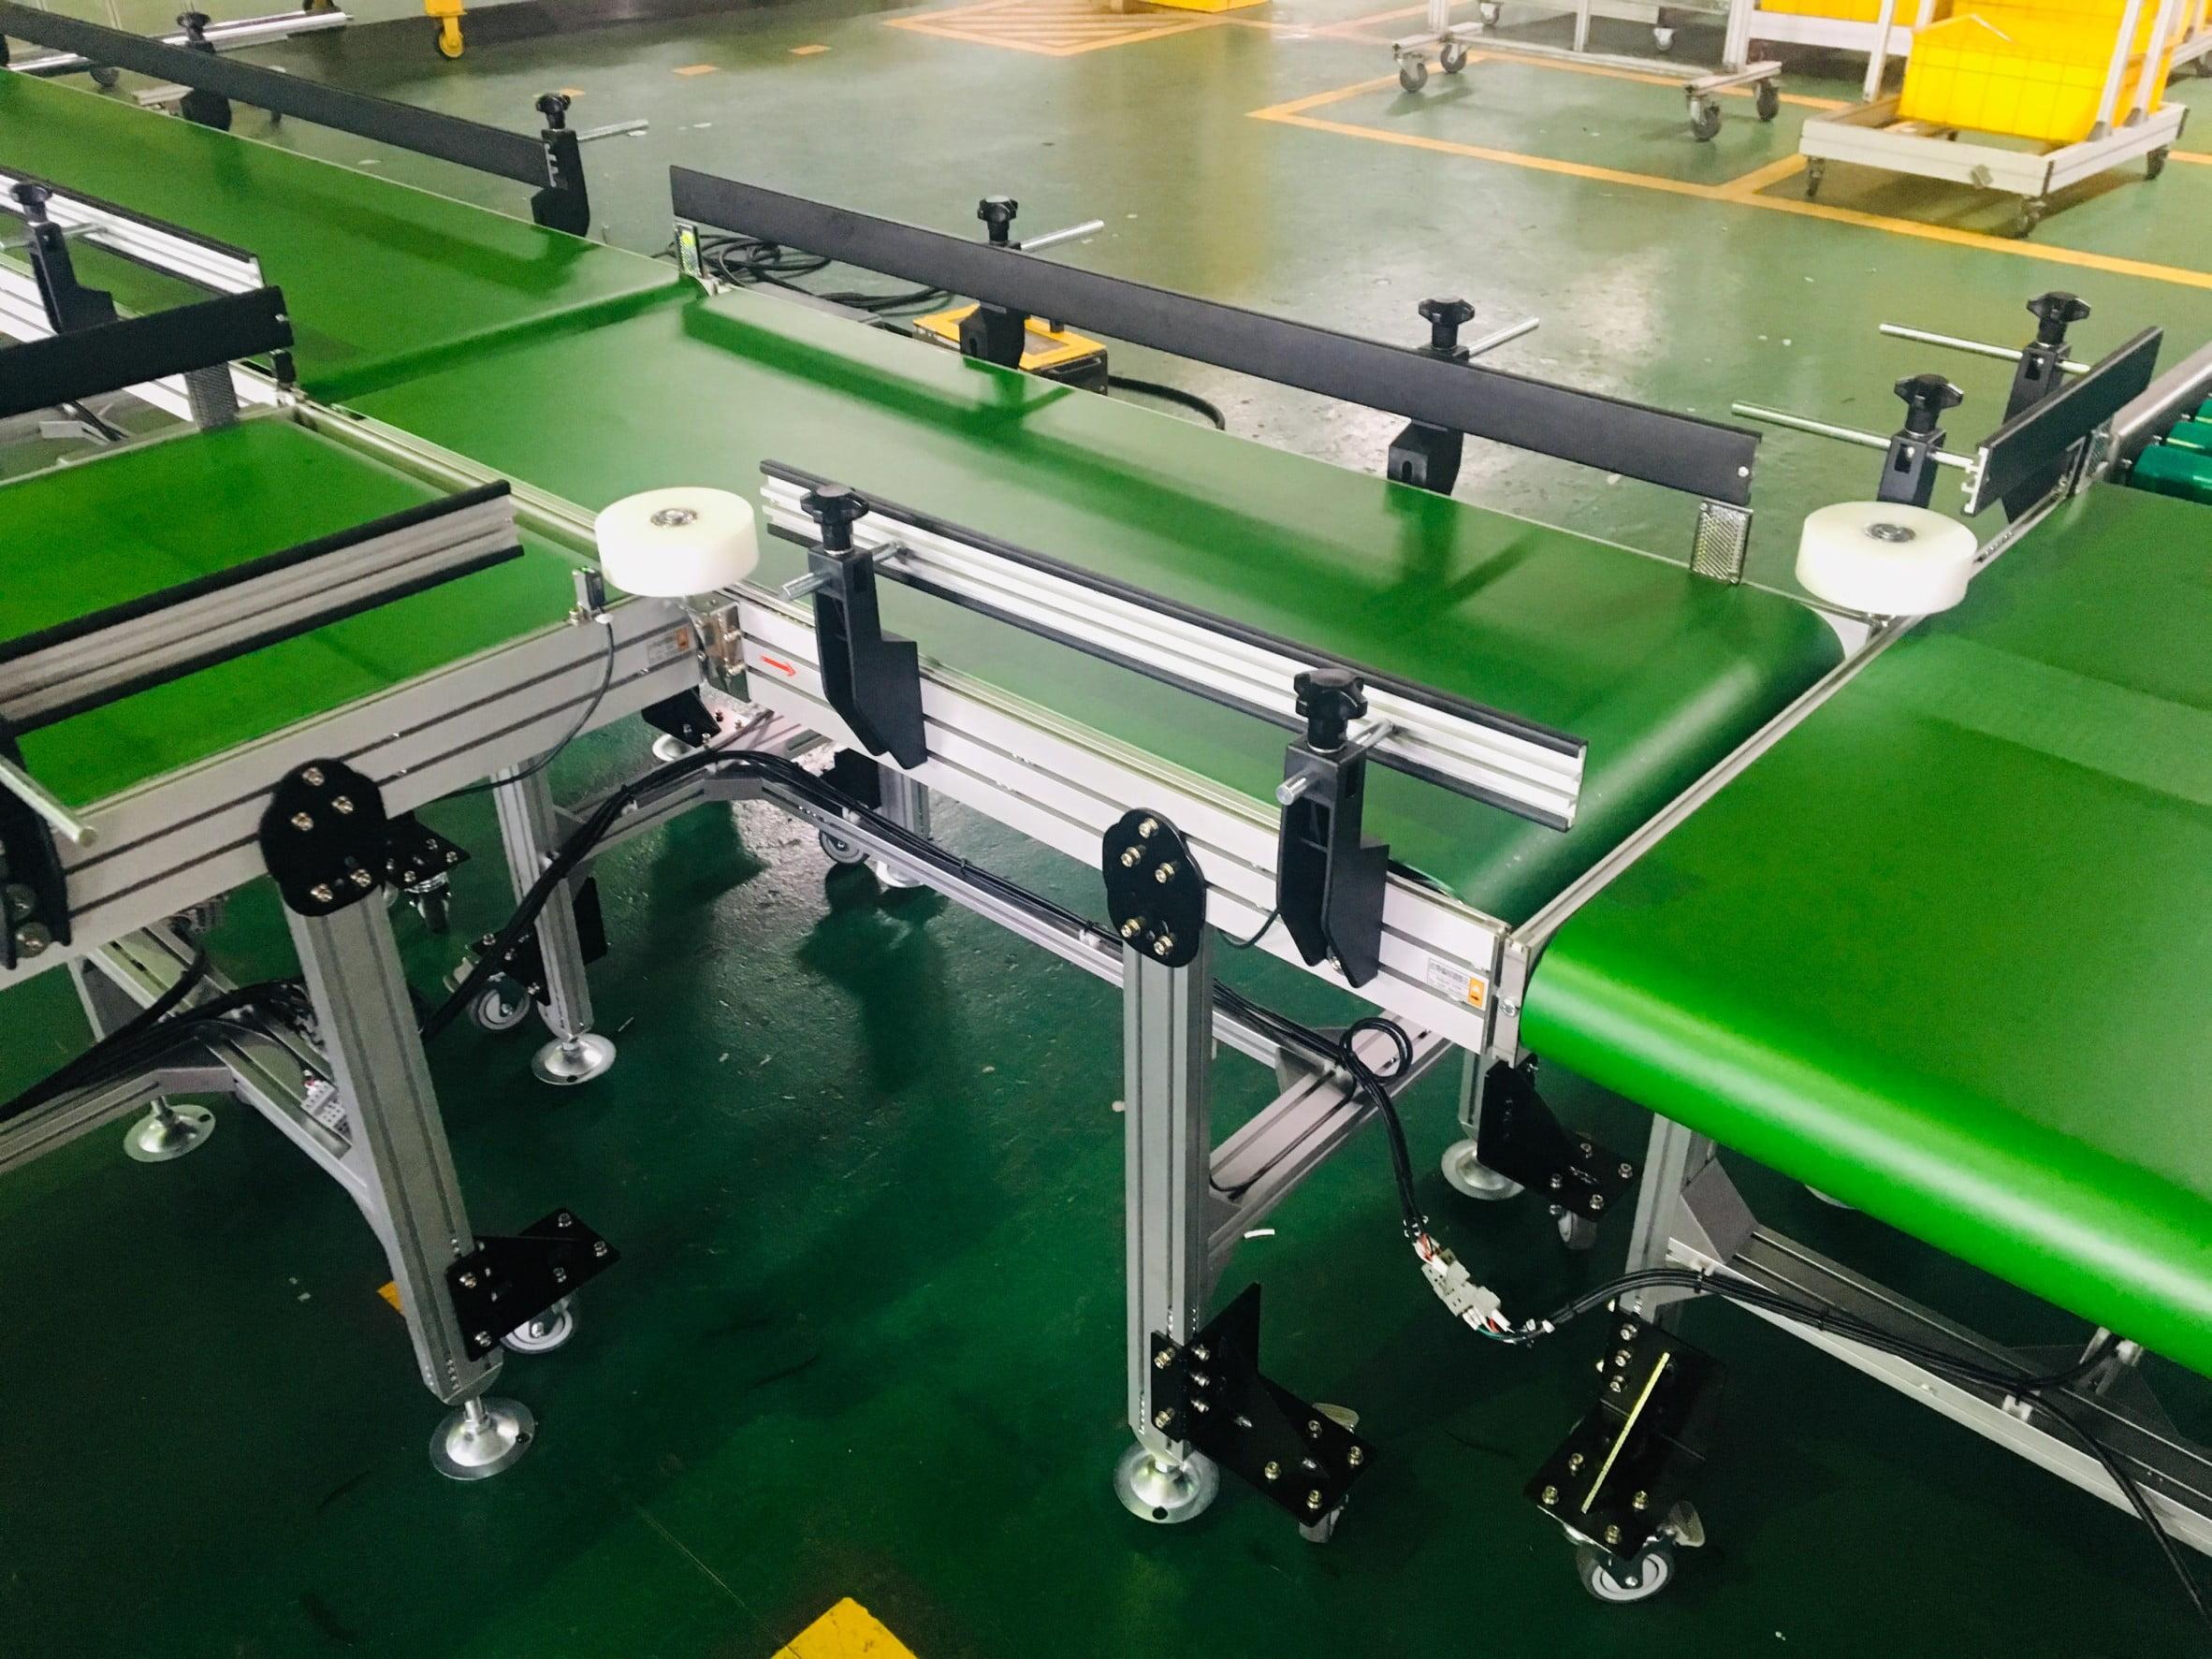 Confluence type aluminum extrusion belt whole plant conveyor -Lichen Conveyor Equipment Co., Ltd.